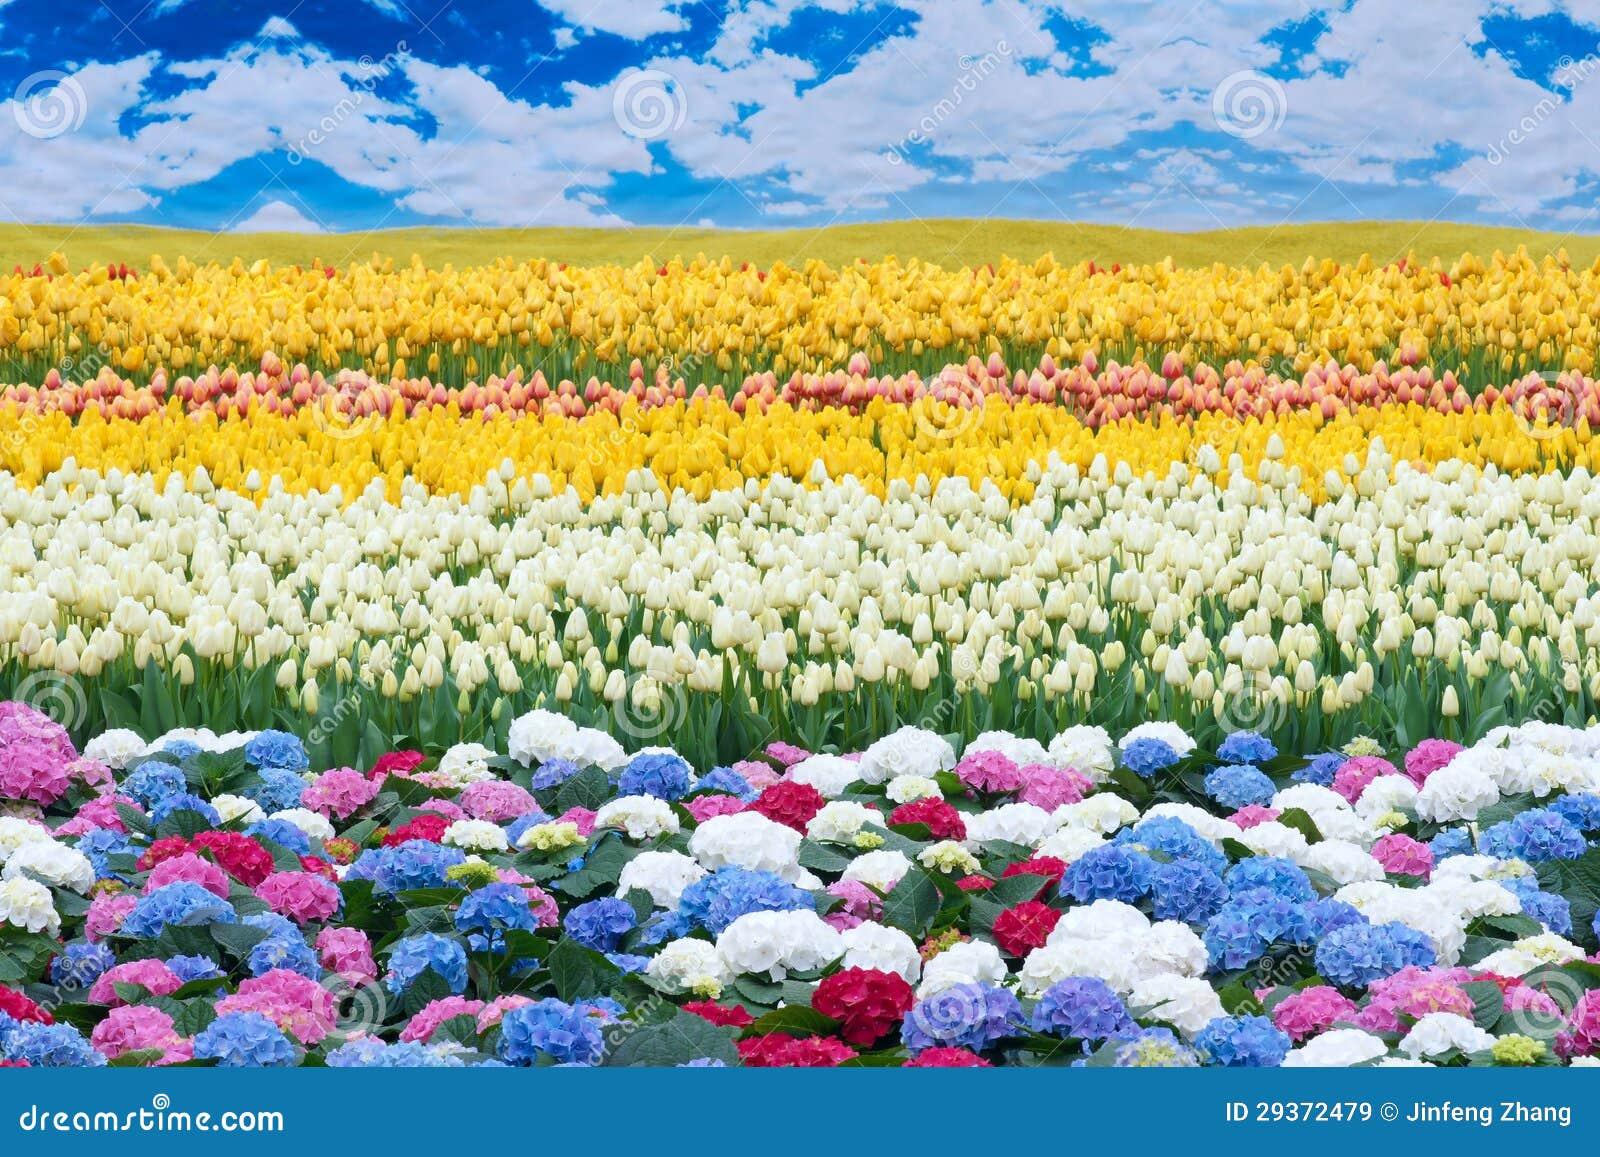 Flower scenery royalty free stock images image 29372479 - Flower Scenery Flower